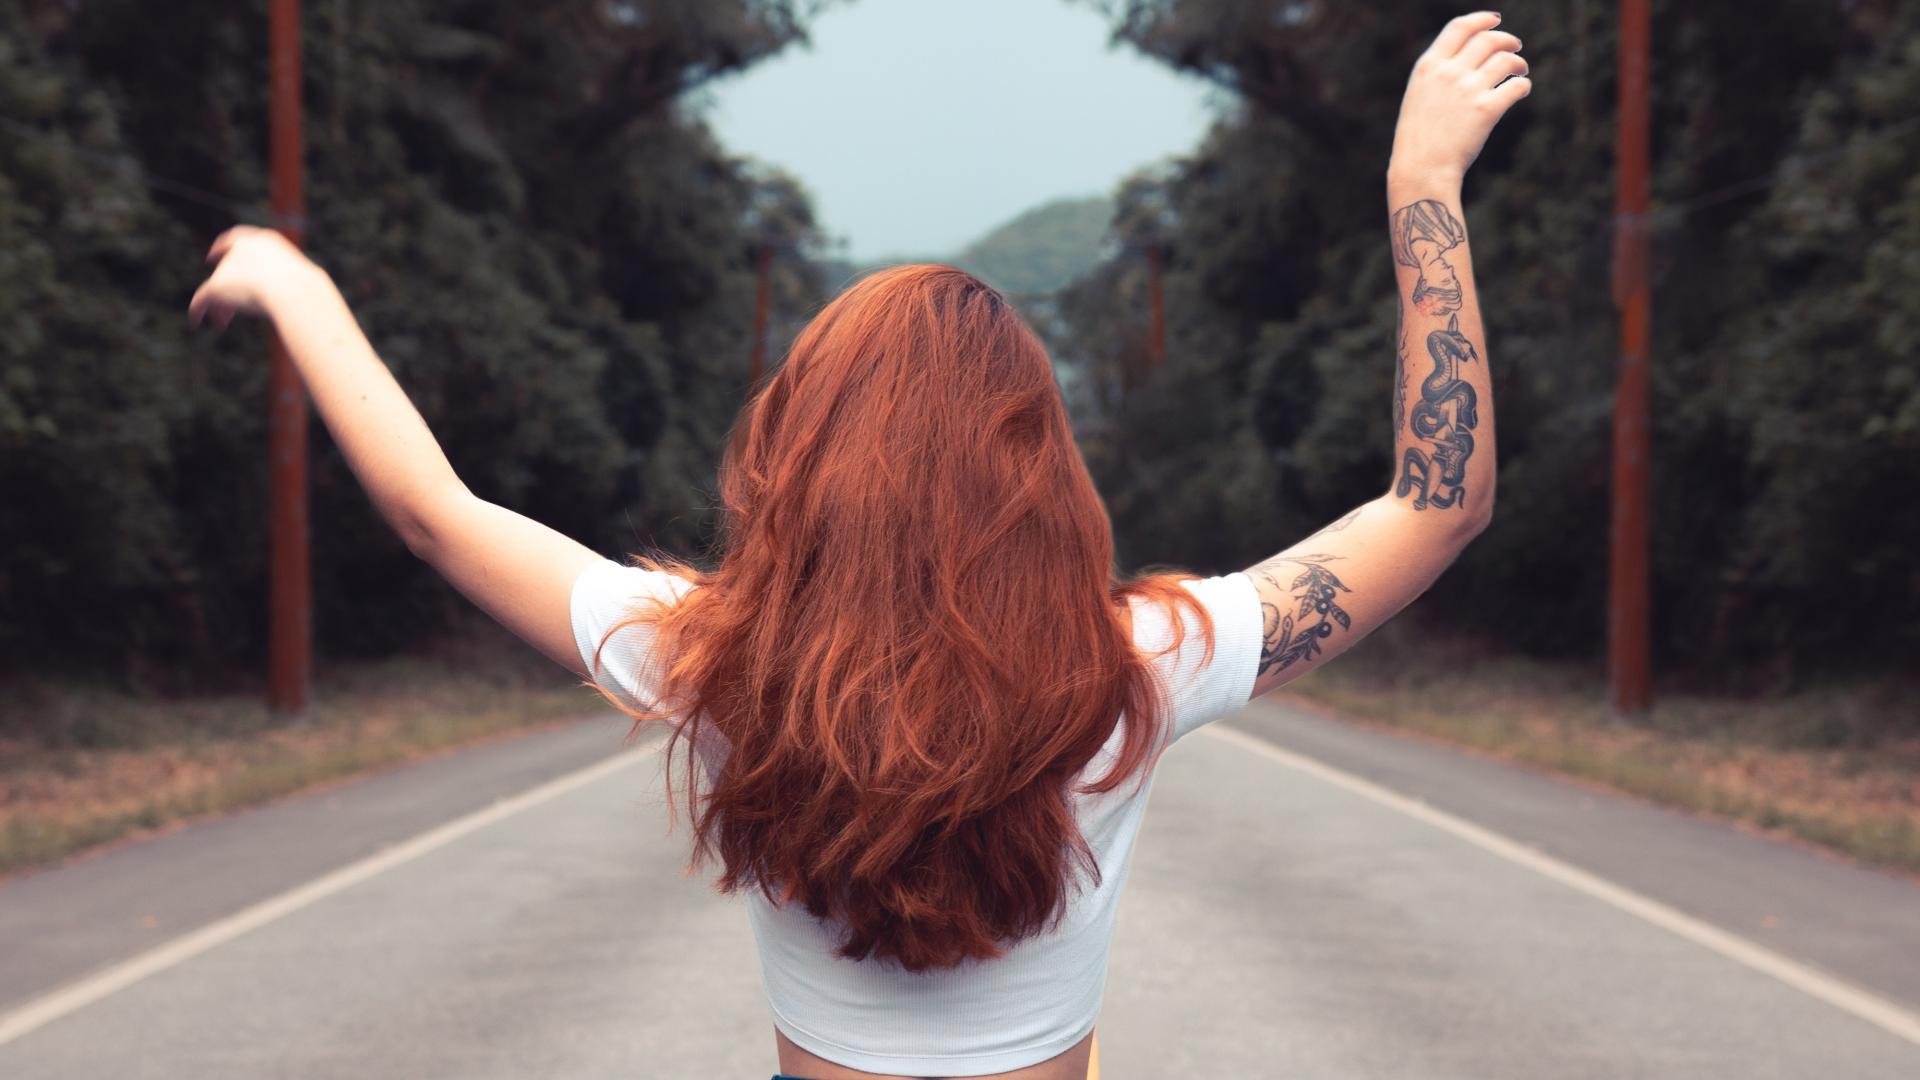 Frau Straße rote Haare Tattoo